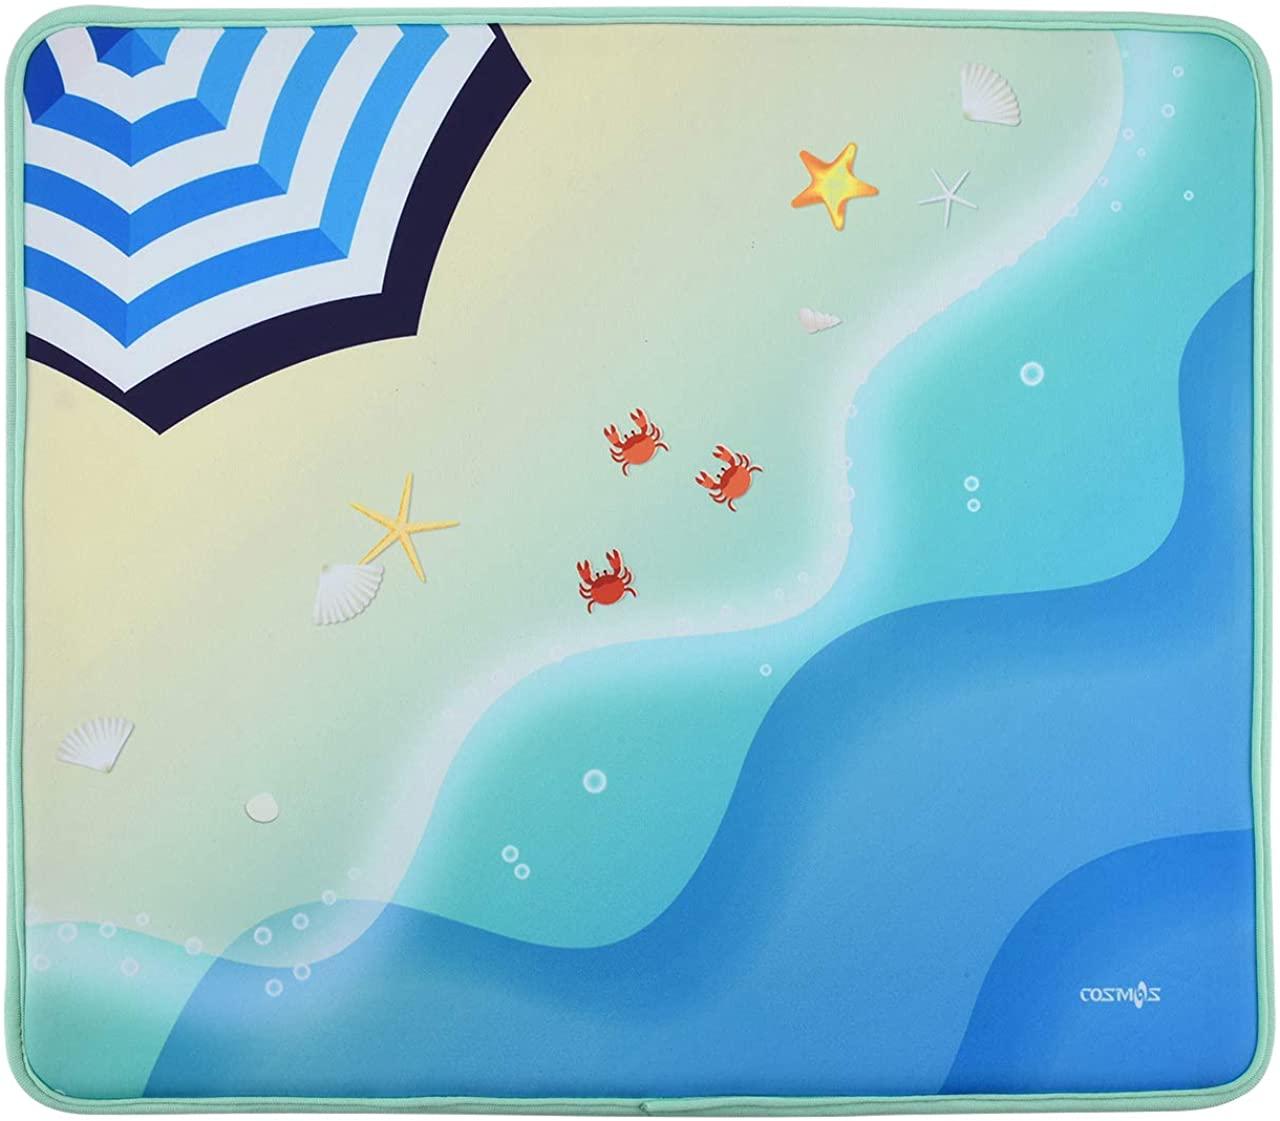 CM Multifunction Soft Neoprene Swimming Pool Mat Poolside Seating Mat Pool Cushion Pad Beach Mat for Beach Swimming Pool, 18 x 15.5 inches